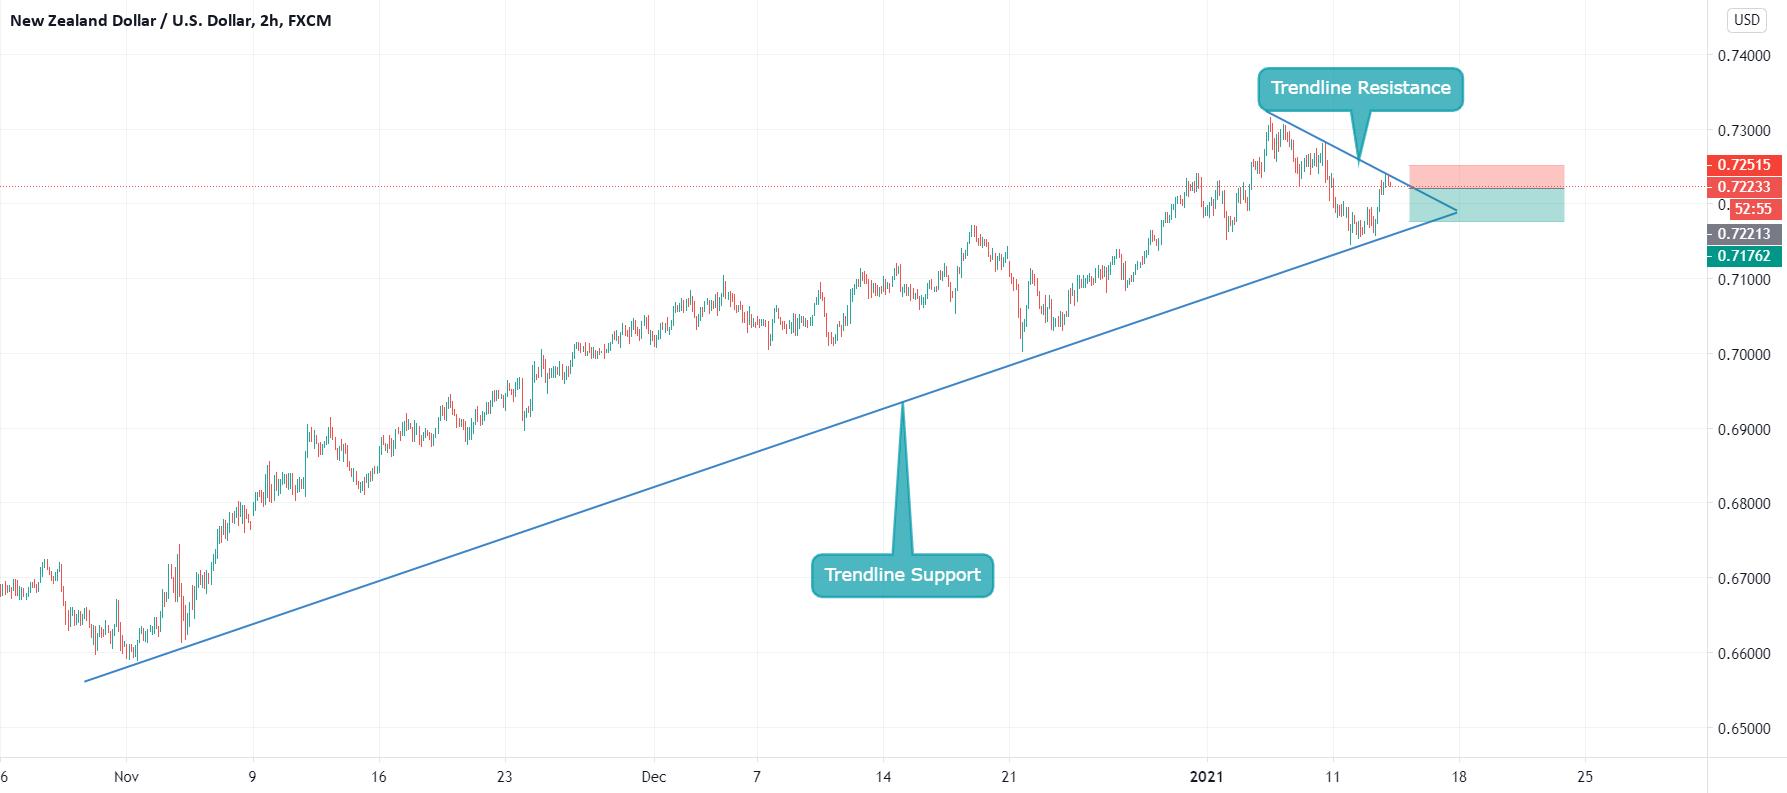 www.tradingview.com